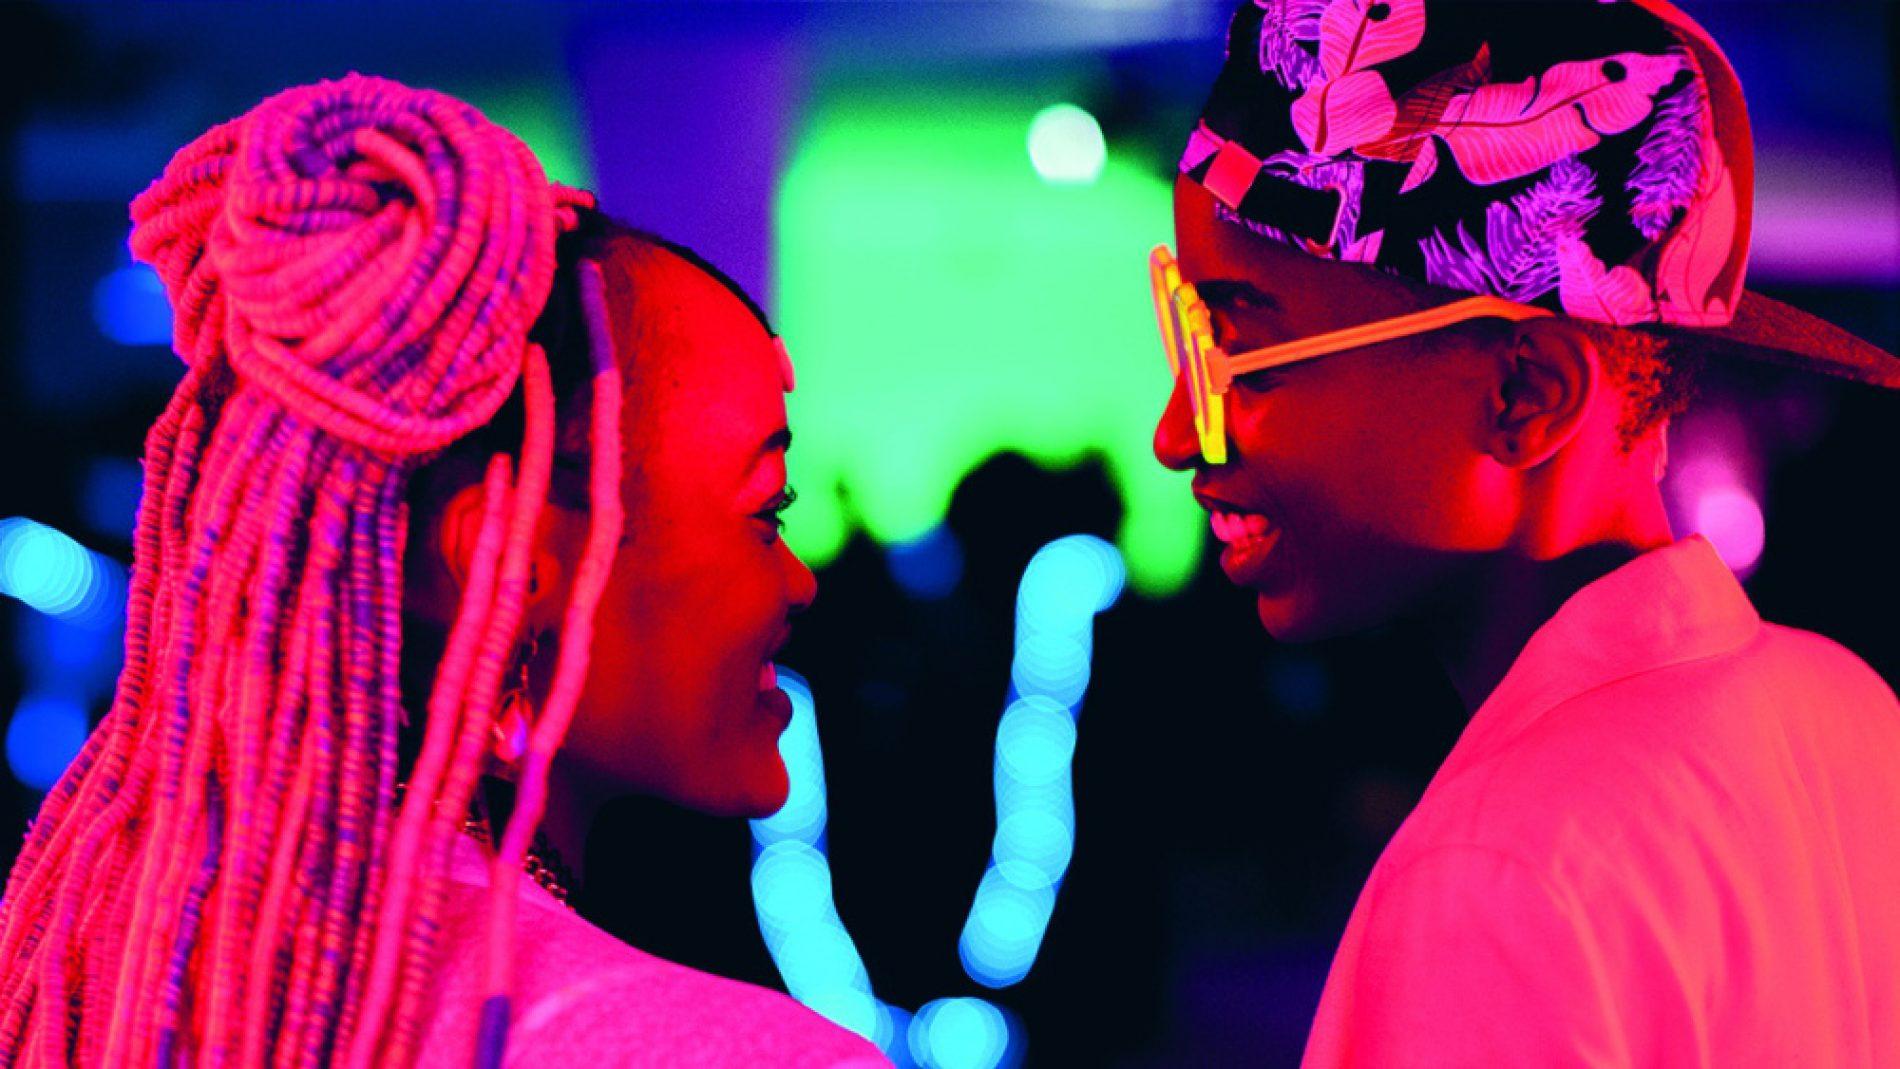 Kenya Bans LGBT Love Story 'Rafiki' Ahead of Its Premiere At Cannes